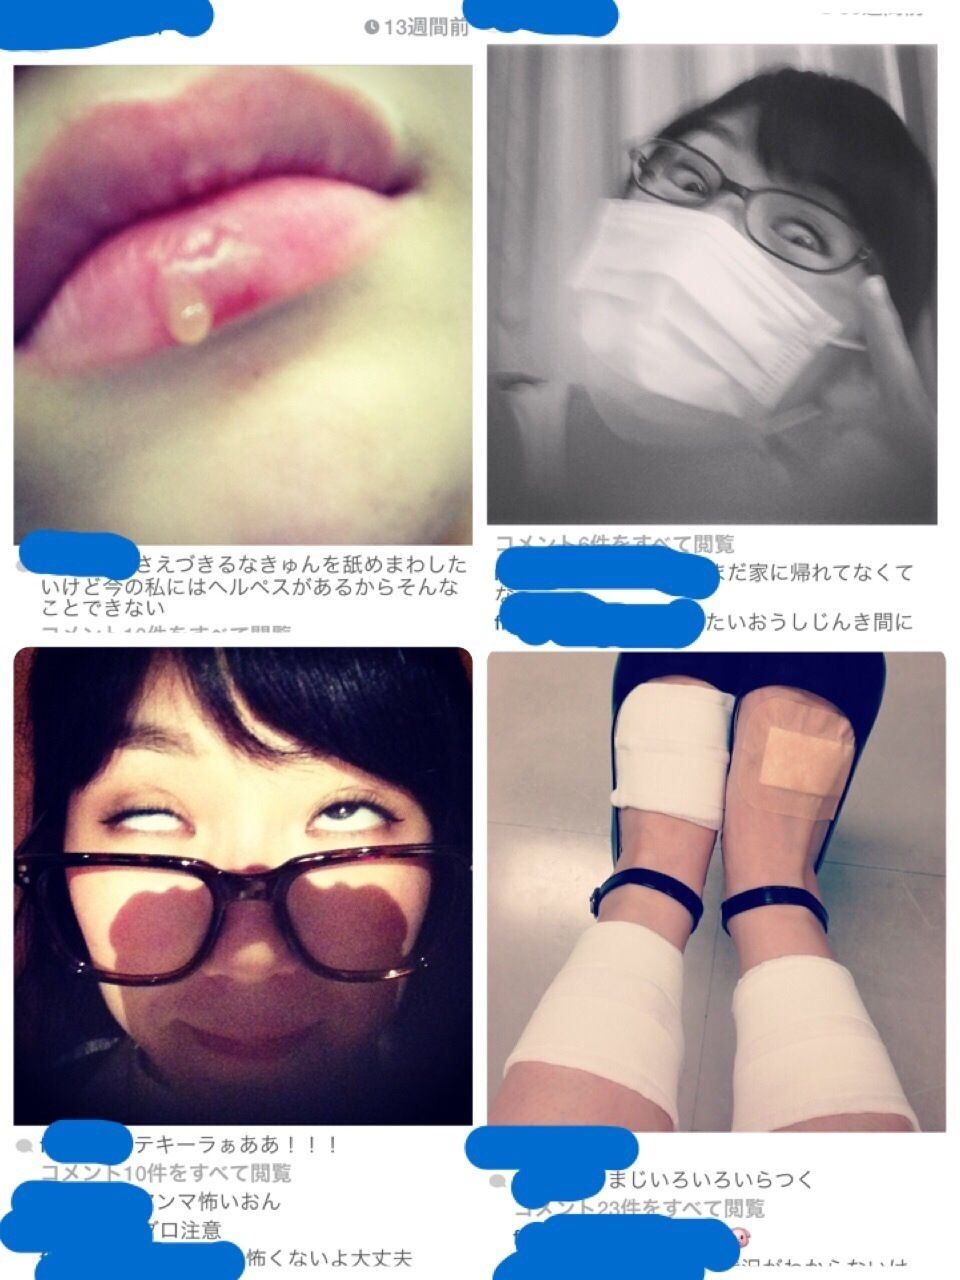 http://livedoor.blogimg.jp/hellopro2ch/imgs/c/2/c27927f2.jpg